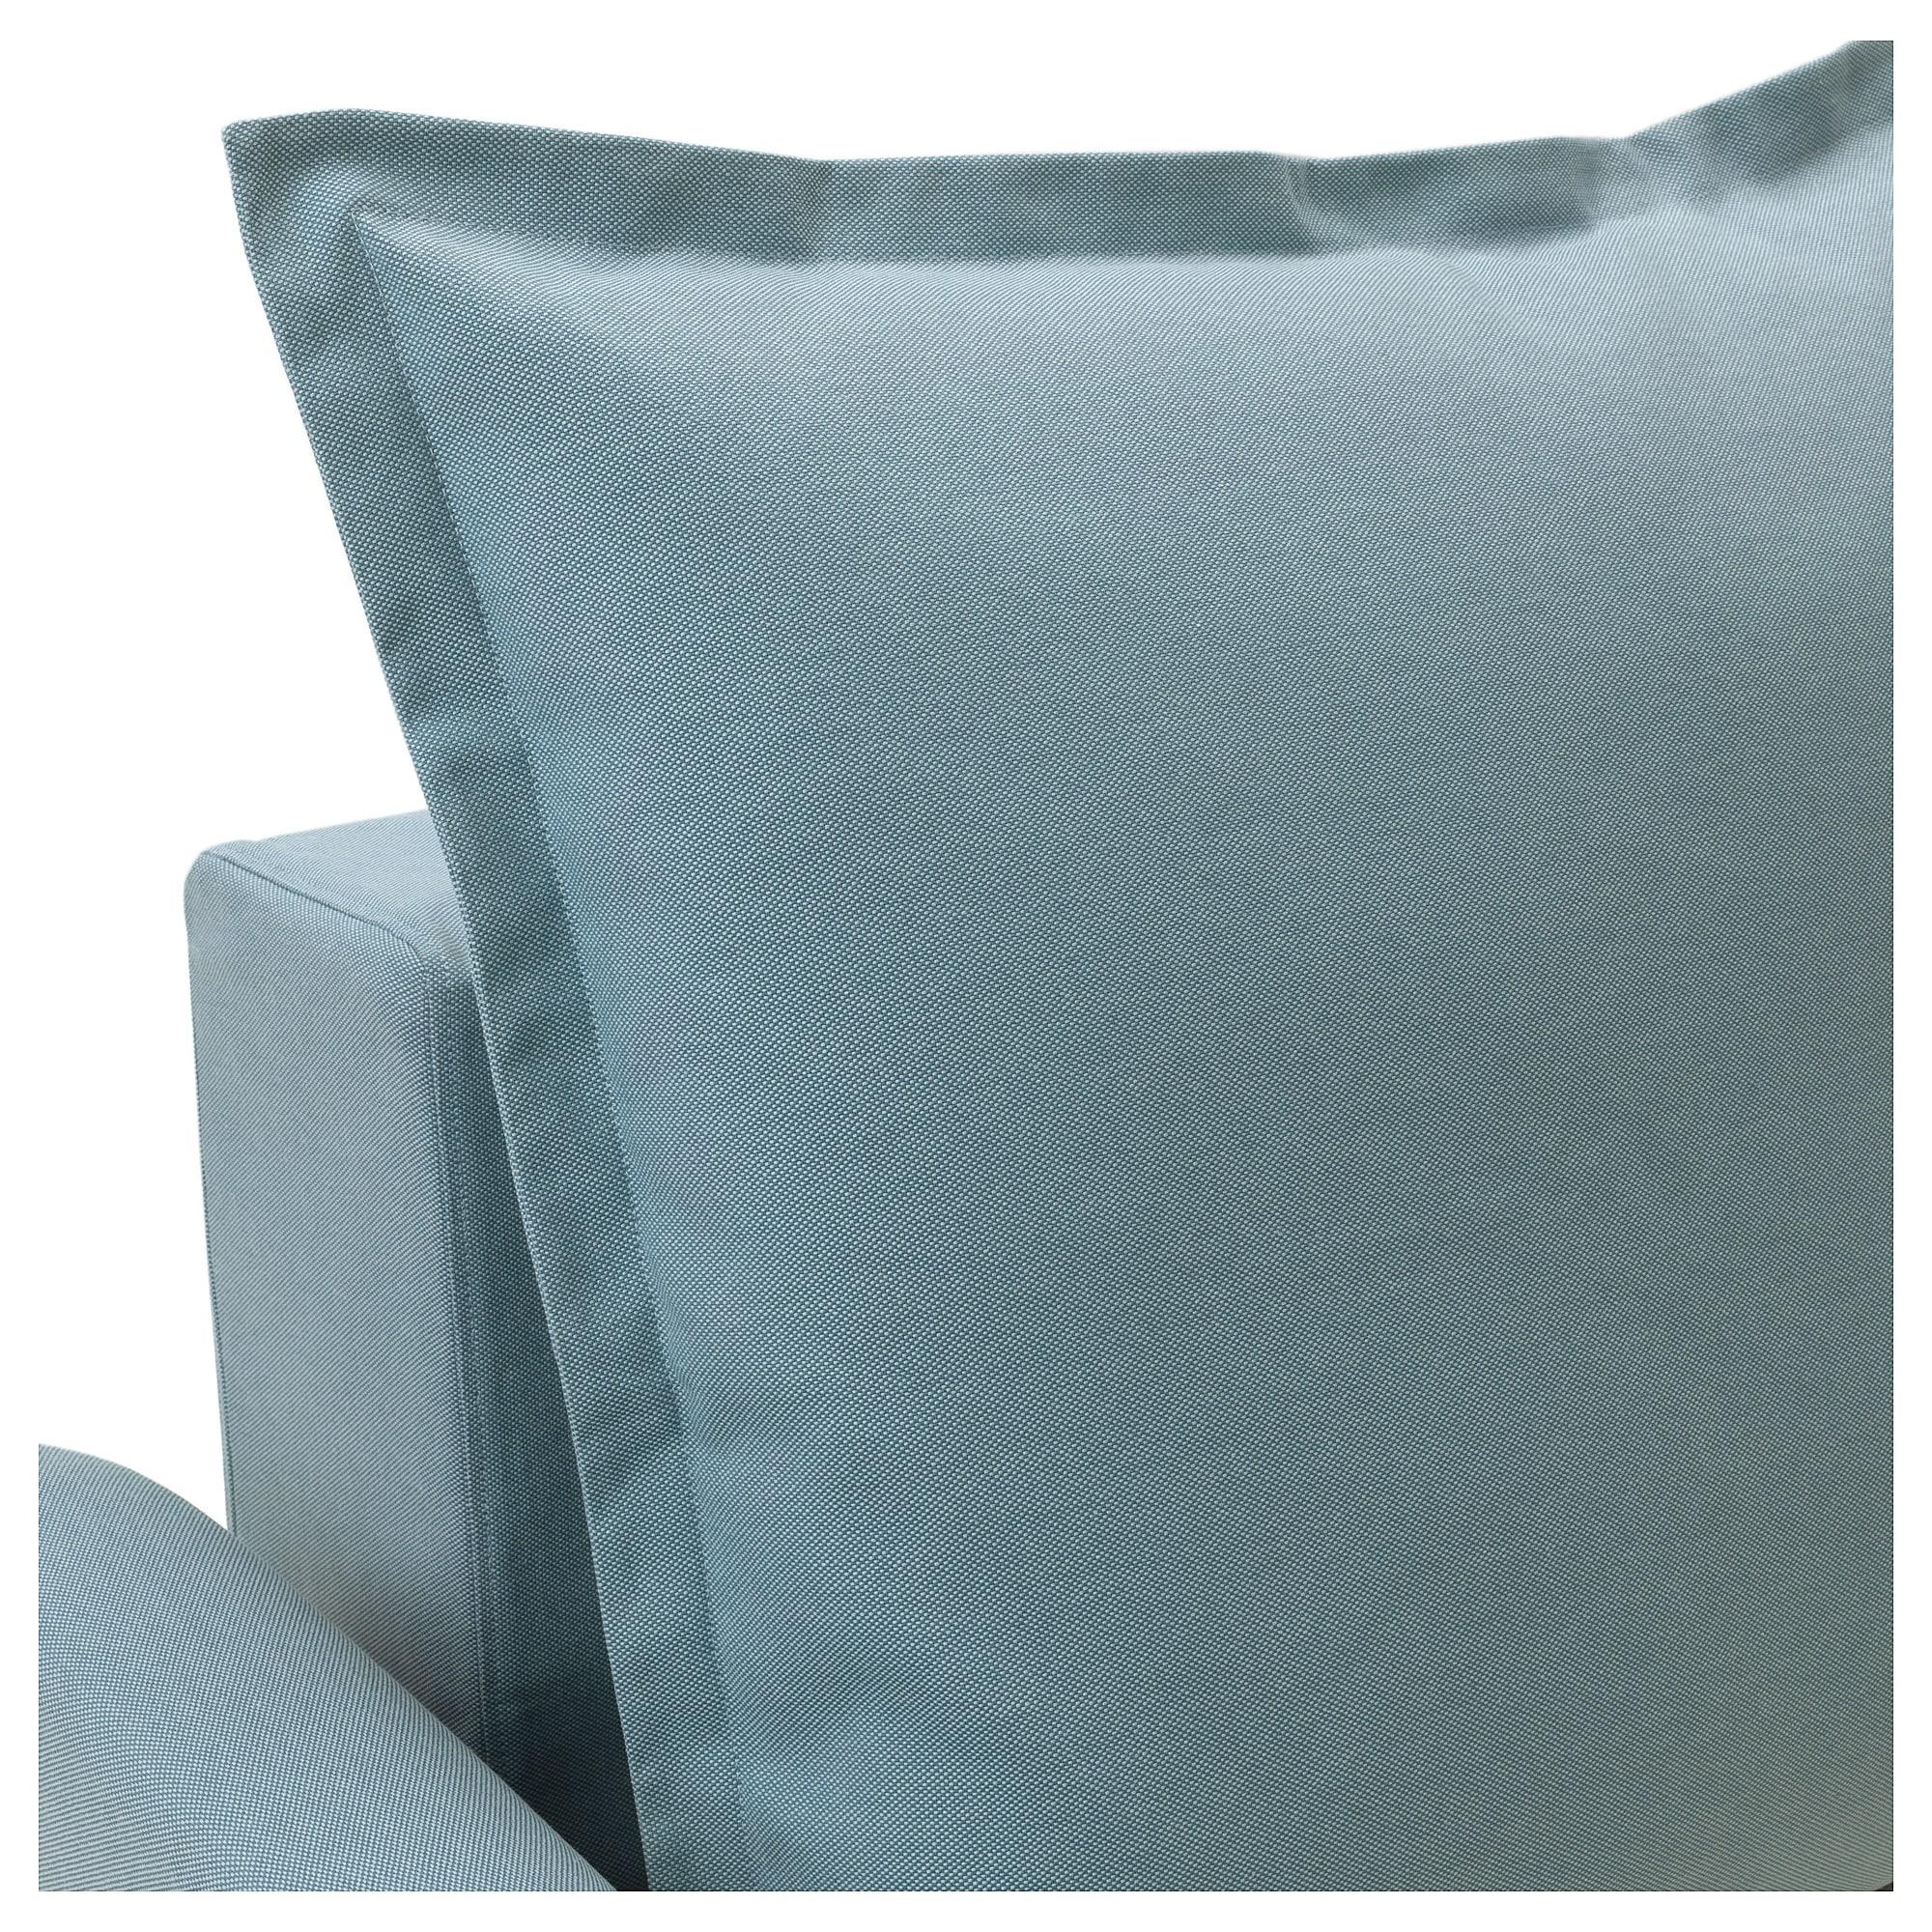 Canapés Convertibles Ikea Impressionnant Image Holmsund Convertible 3 Places orrsta Bleu Clair Ikea